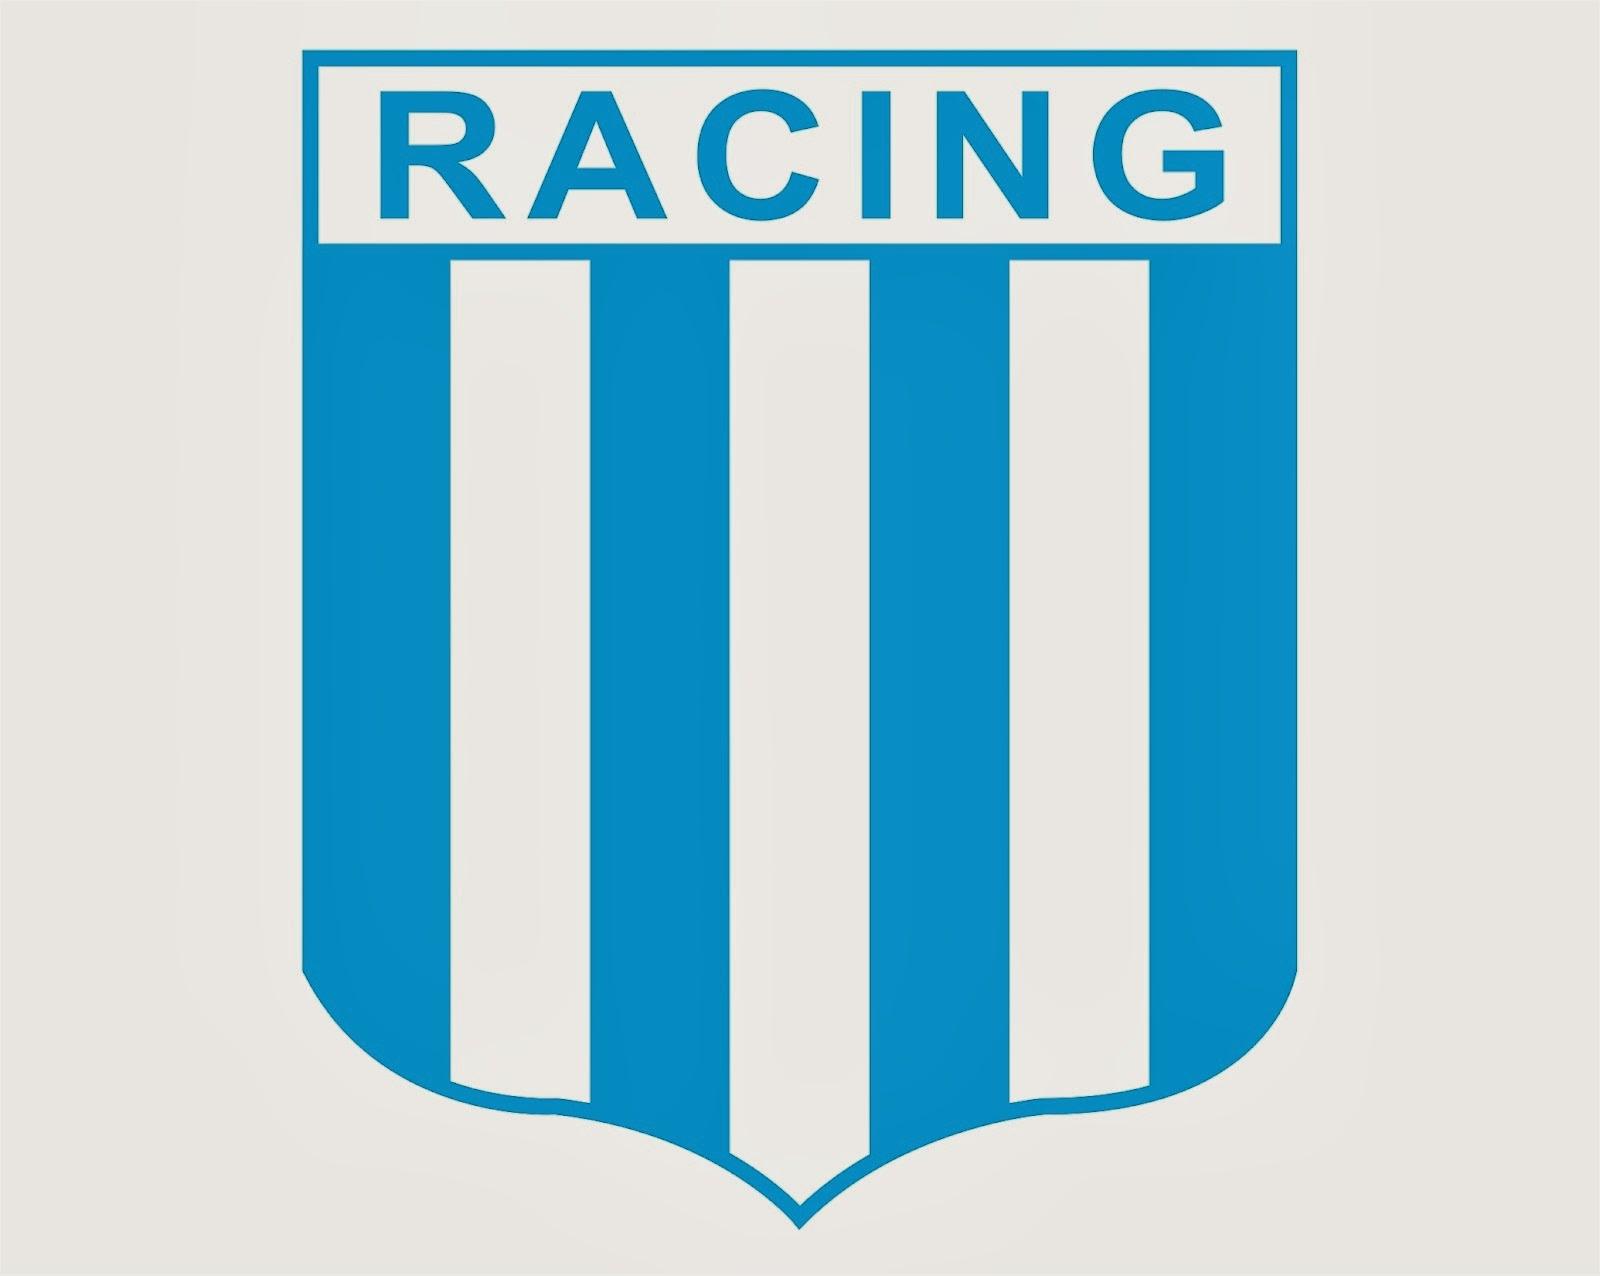 Dibujos - Fondos de escritorio - Imagenes: Escudo de Racing Club o